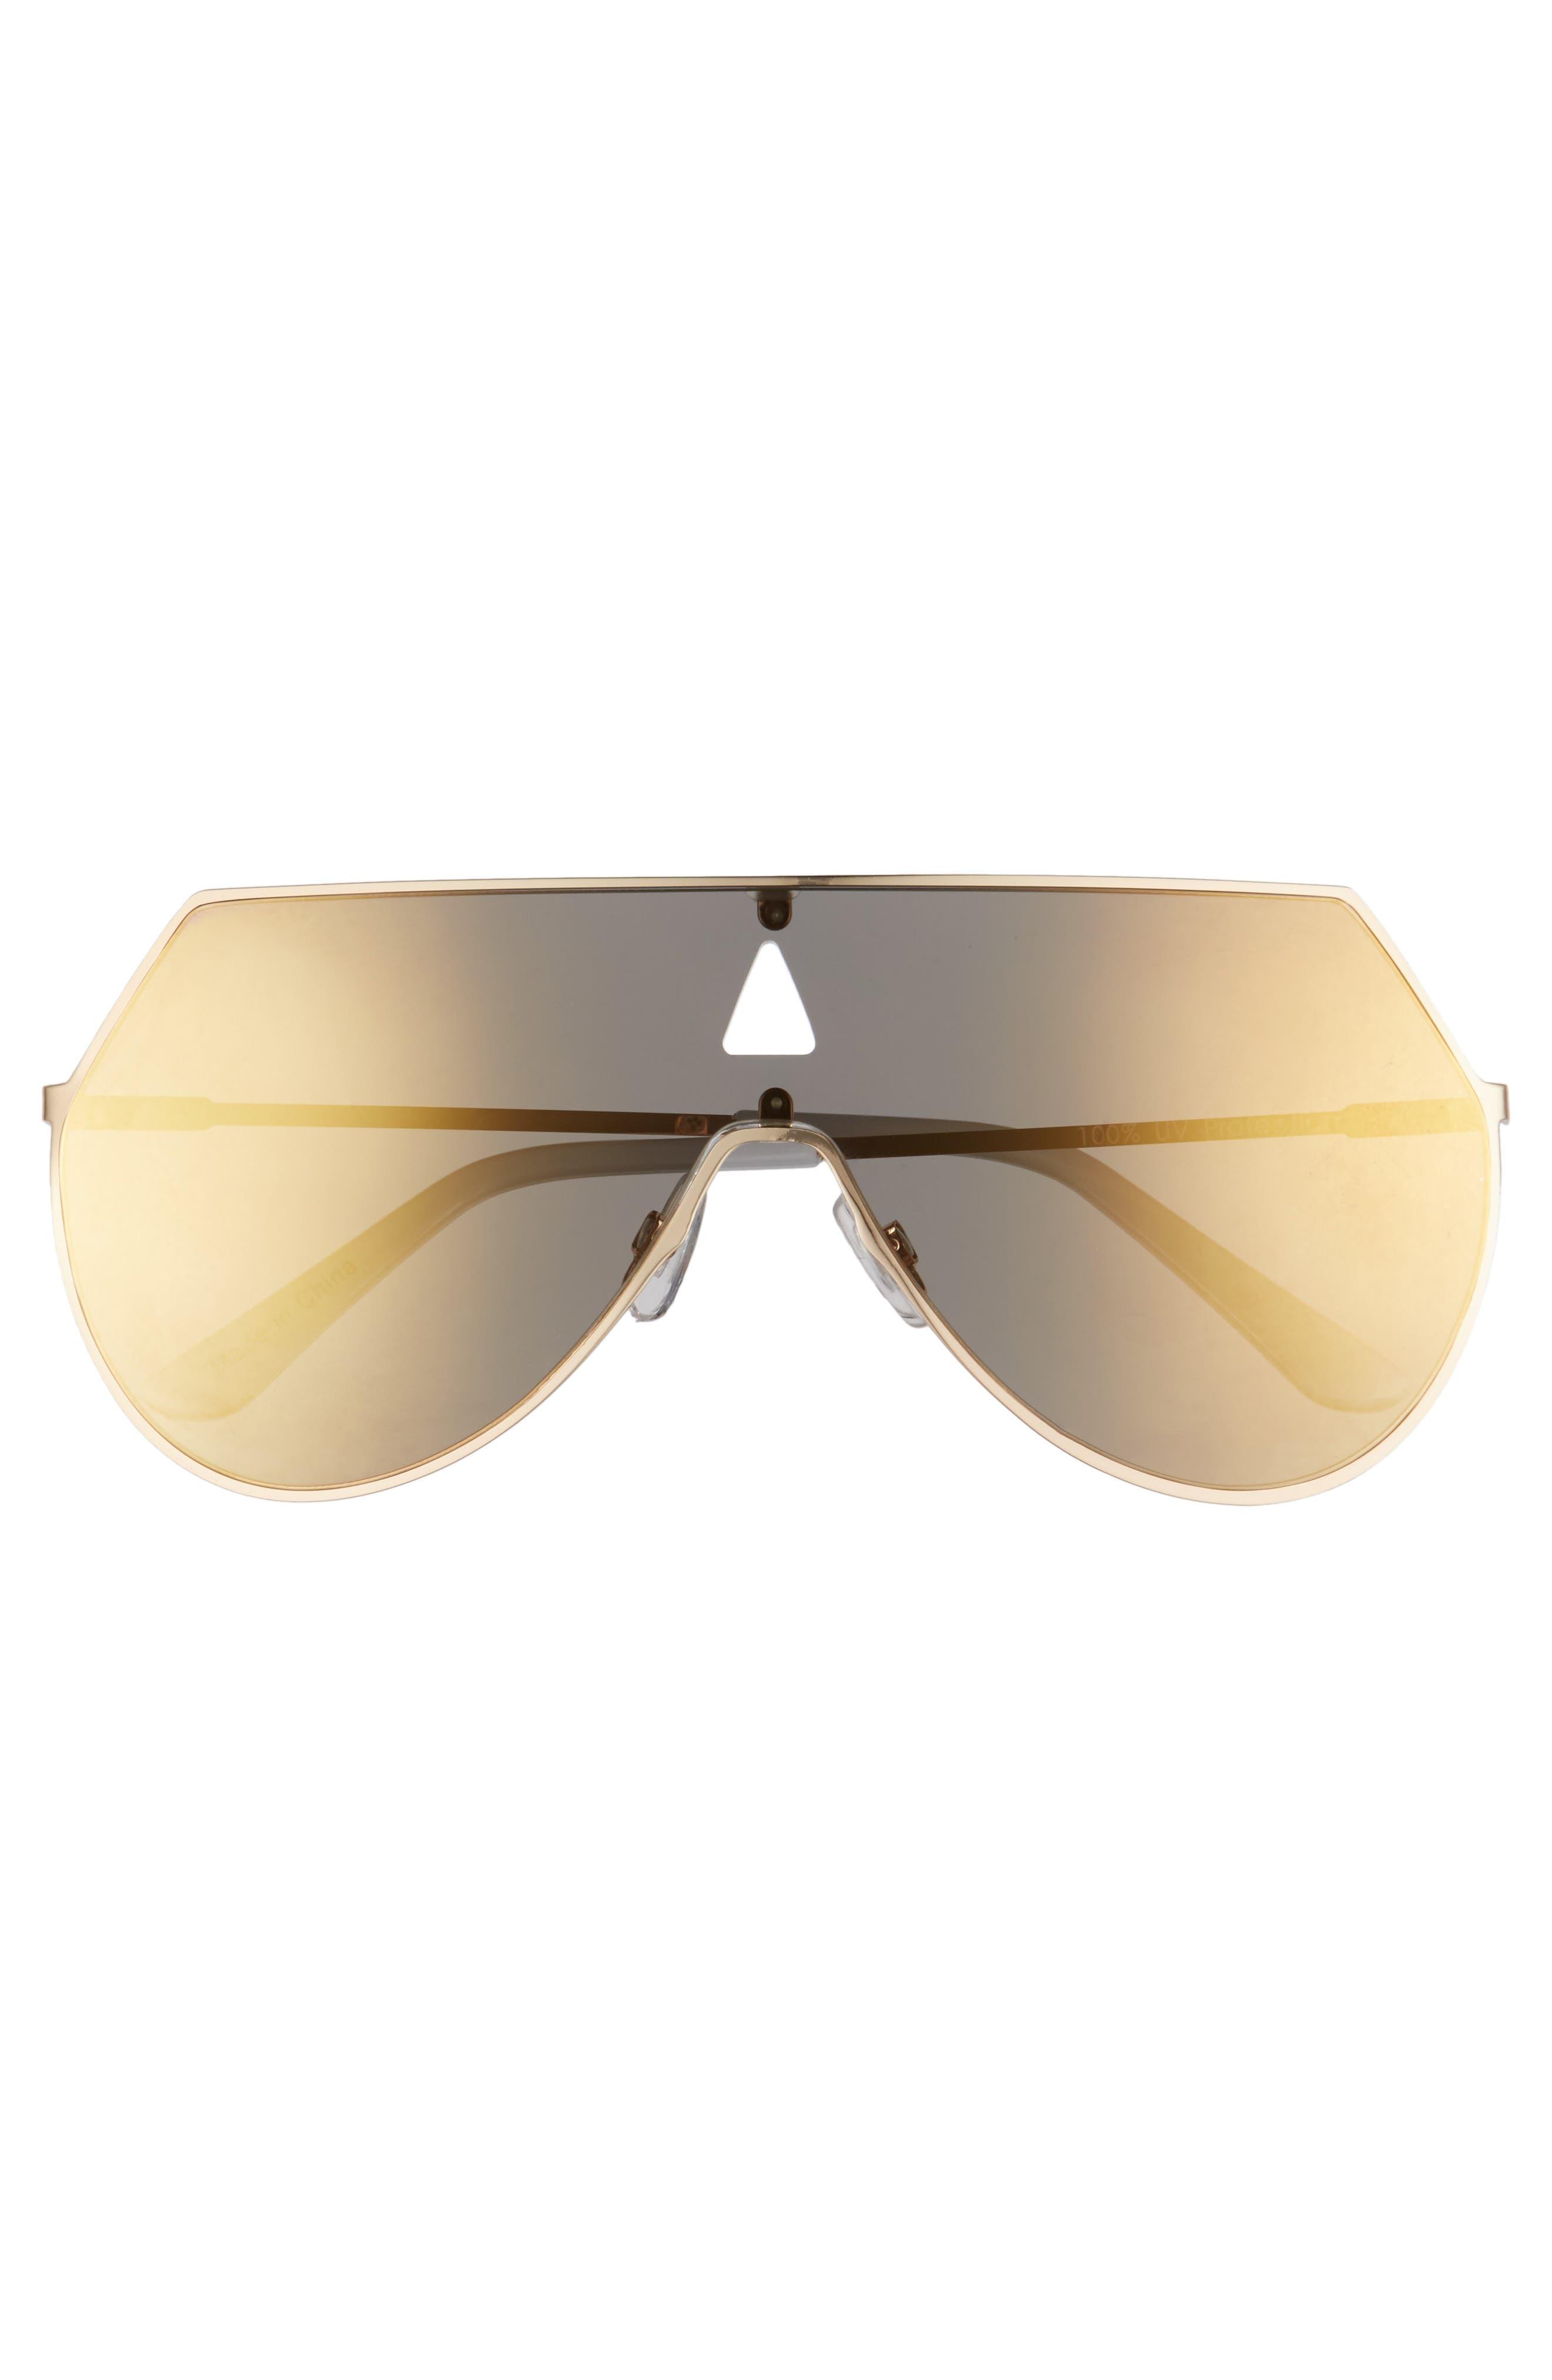 60mm Flat Lens Aviator Sunglasses,                             Alternate thumbnail 3, color,